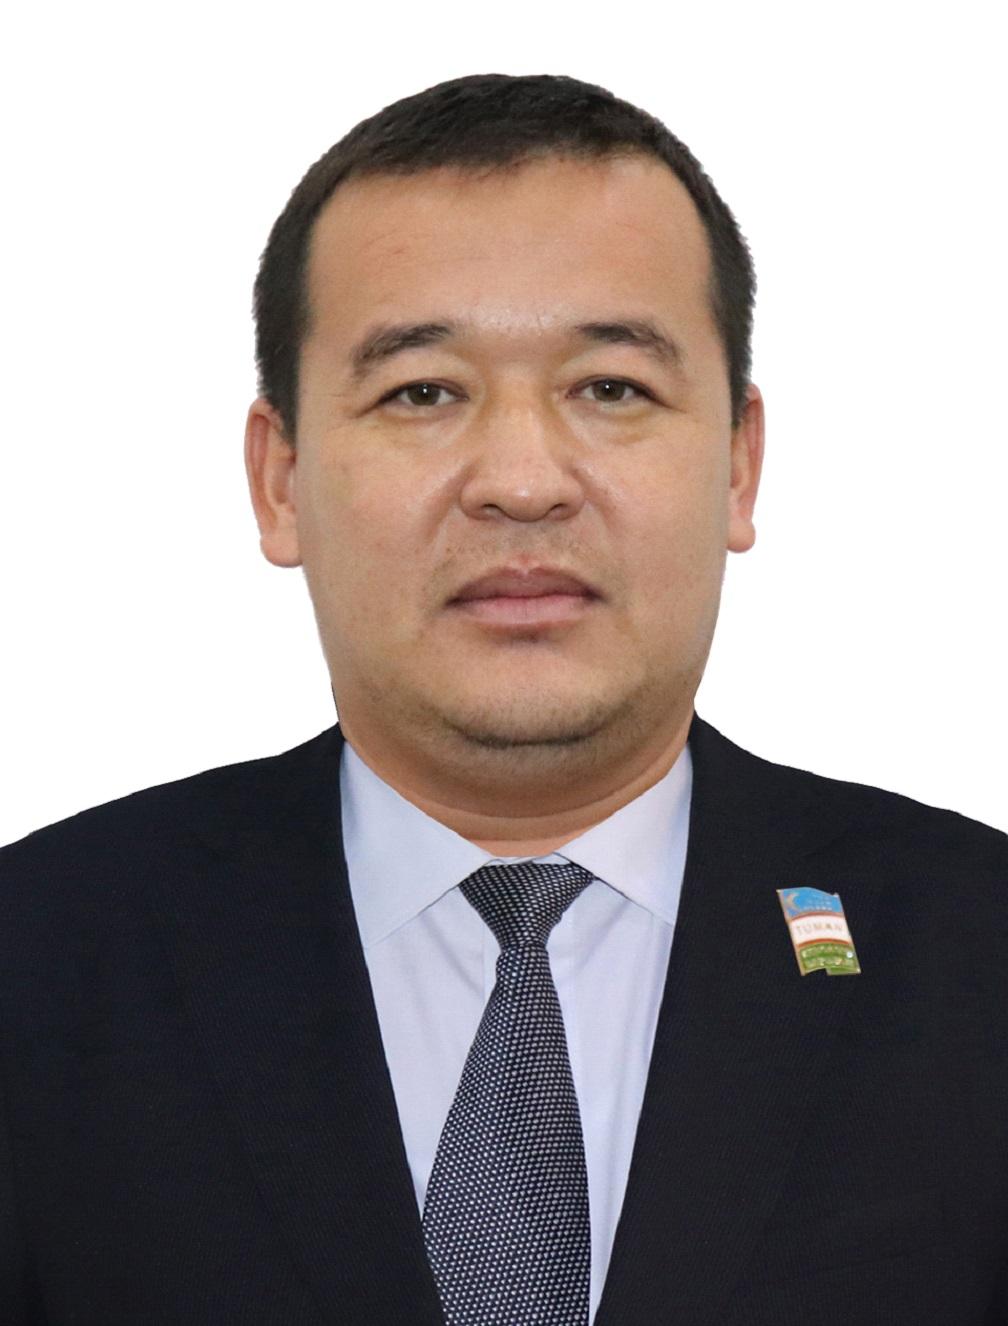 Санаев Зафар  Янгибаевич